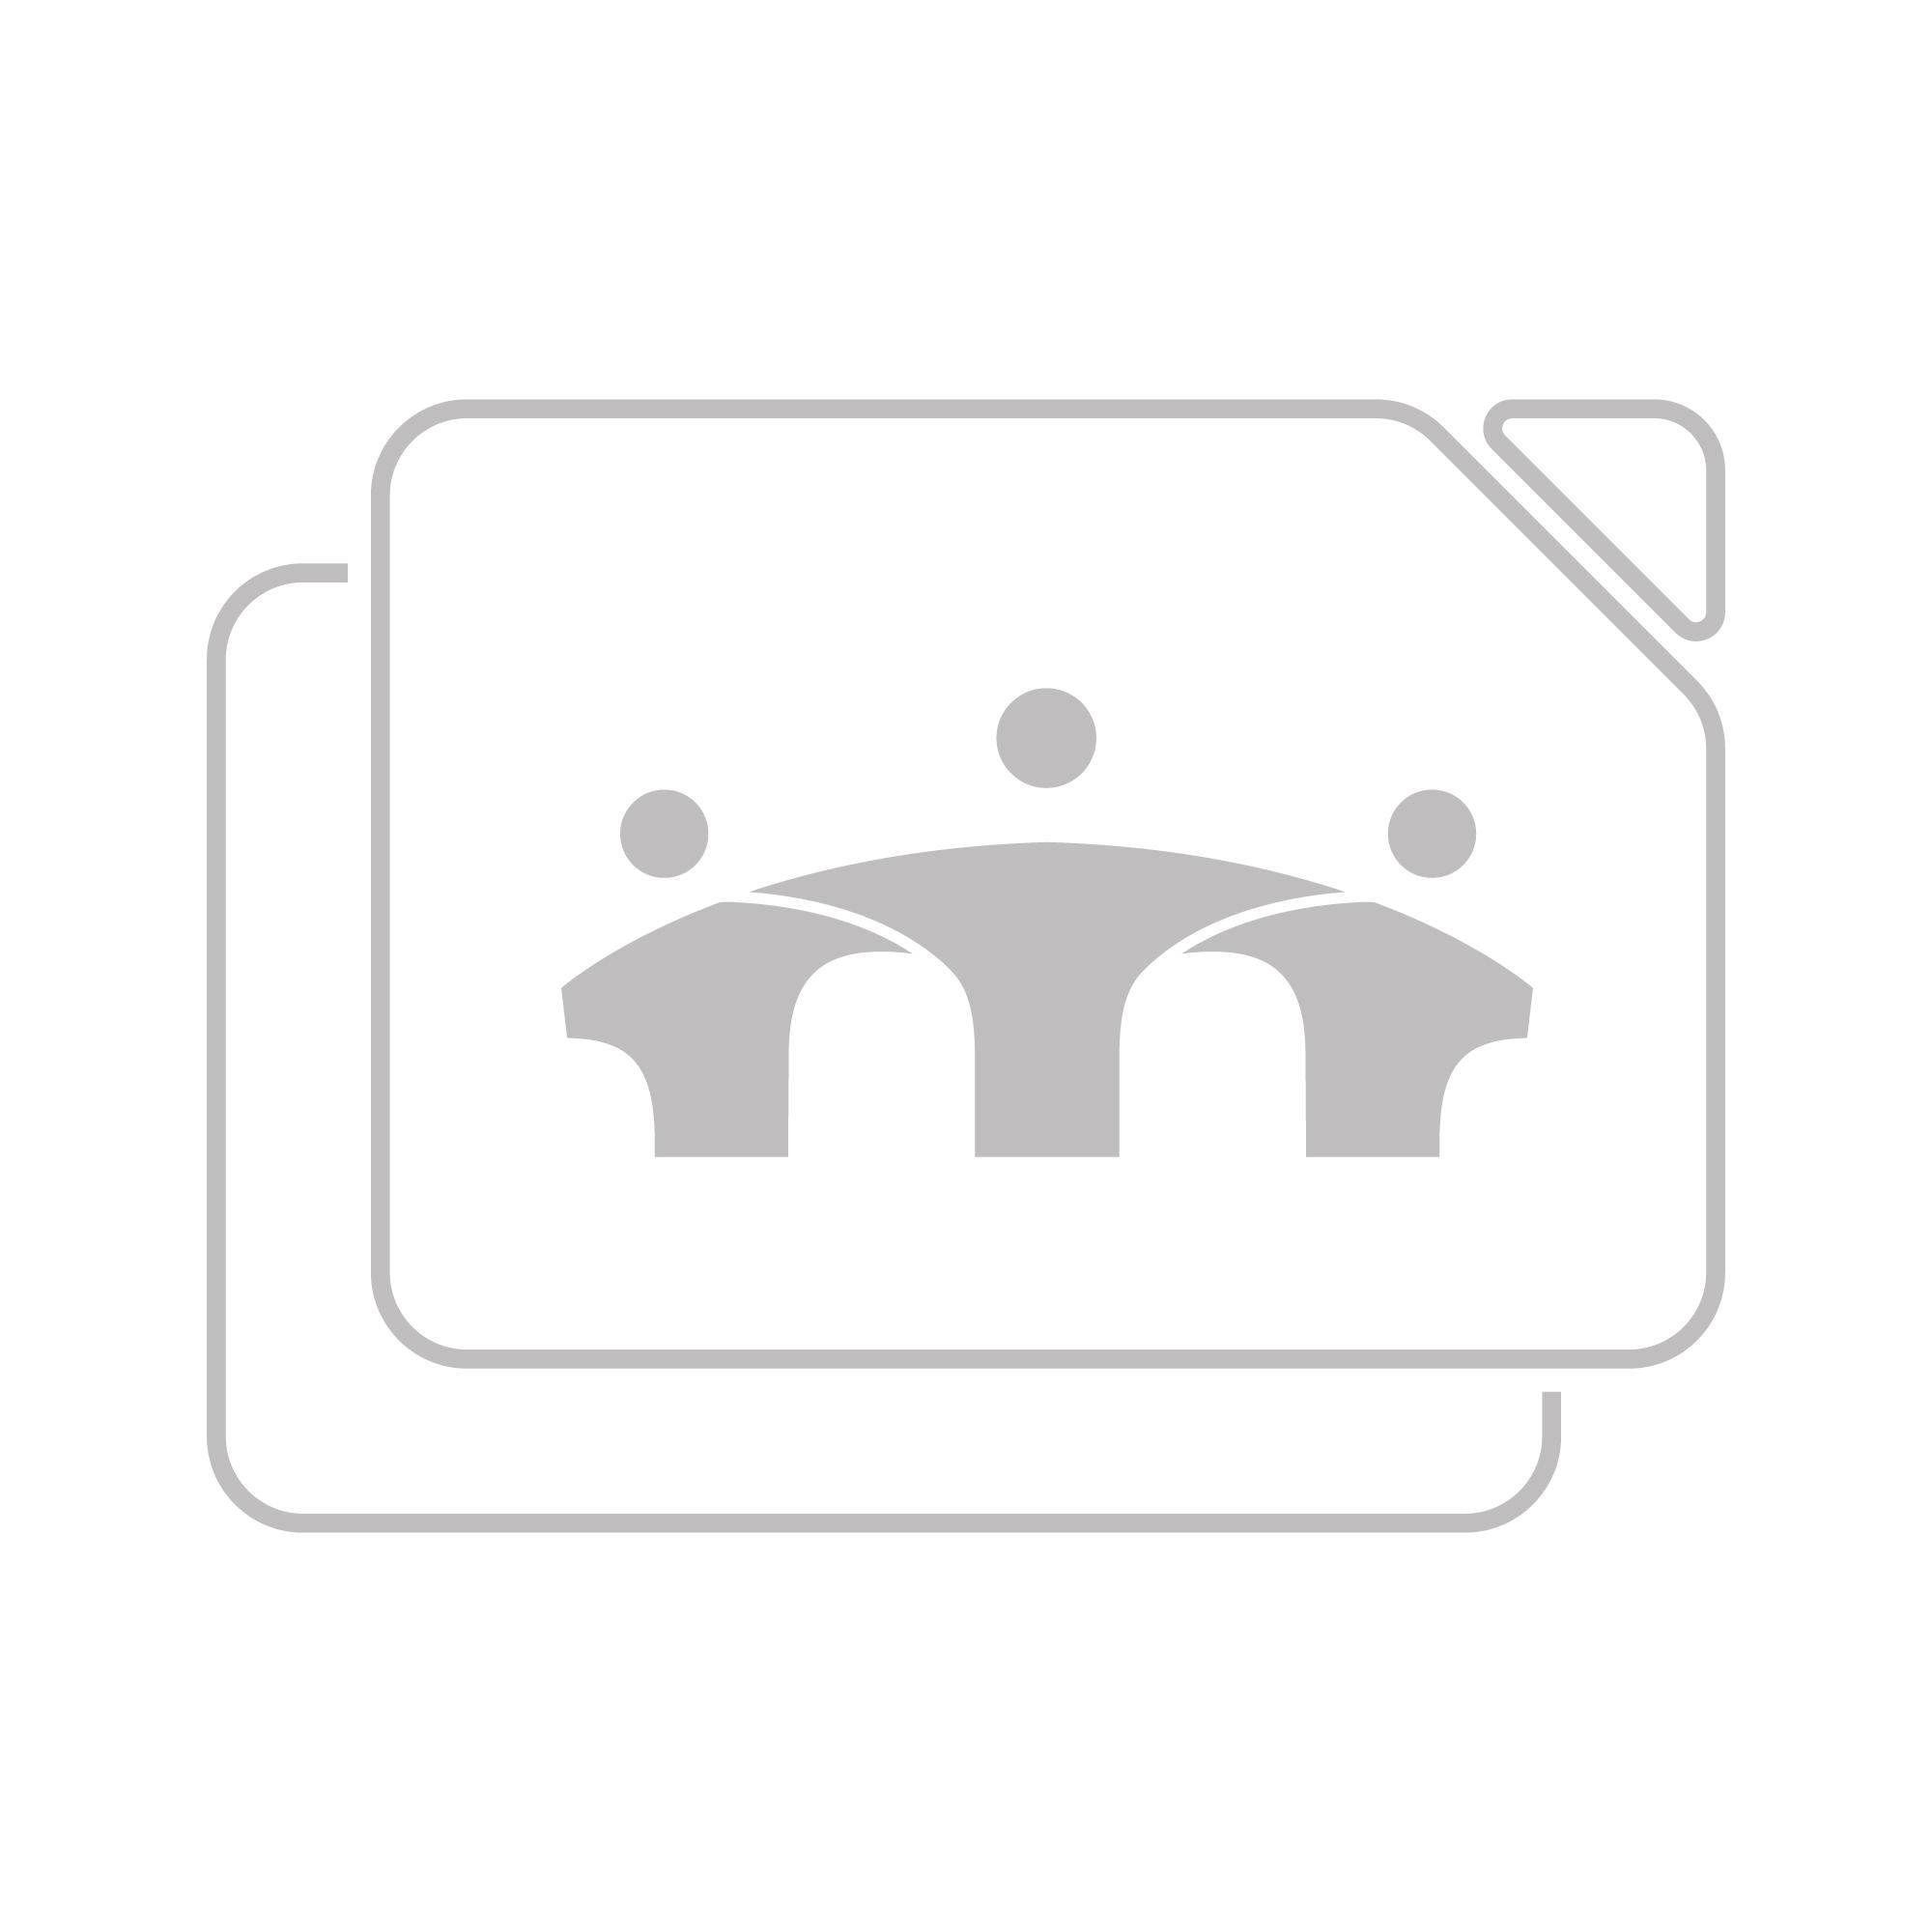 Seagate FireCuda 530 NVMe SSD 500GB Heatsink